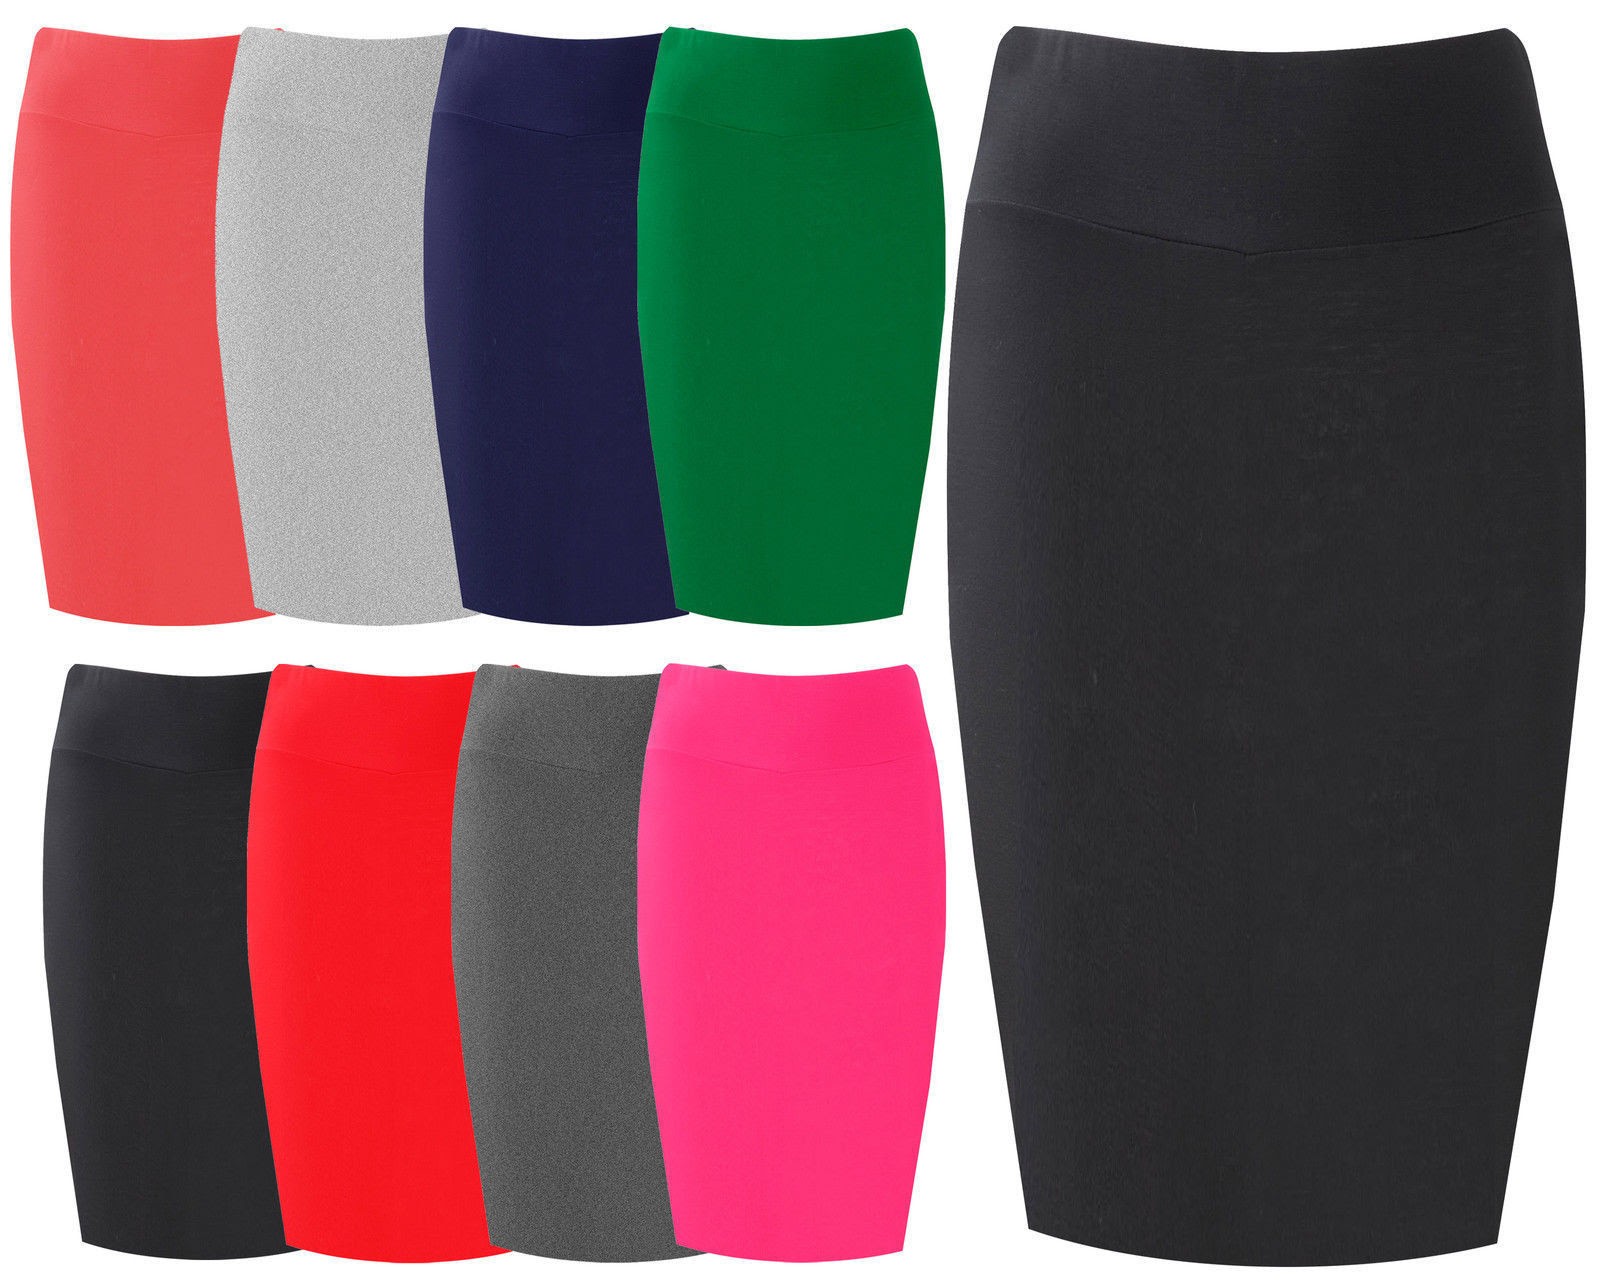 End Collarless Printed Bikini sleeves deals khaki repair